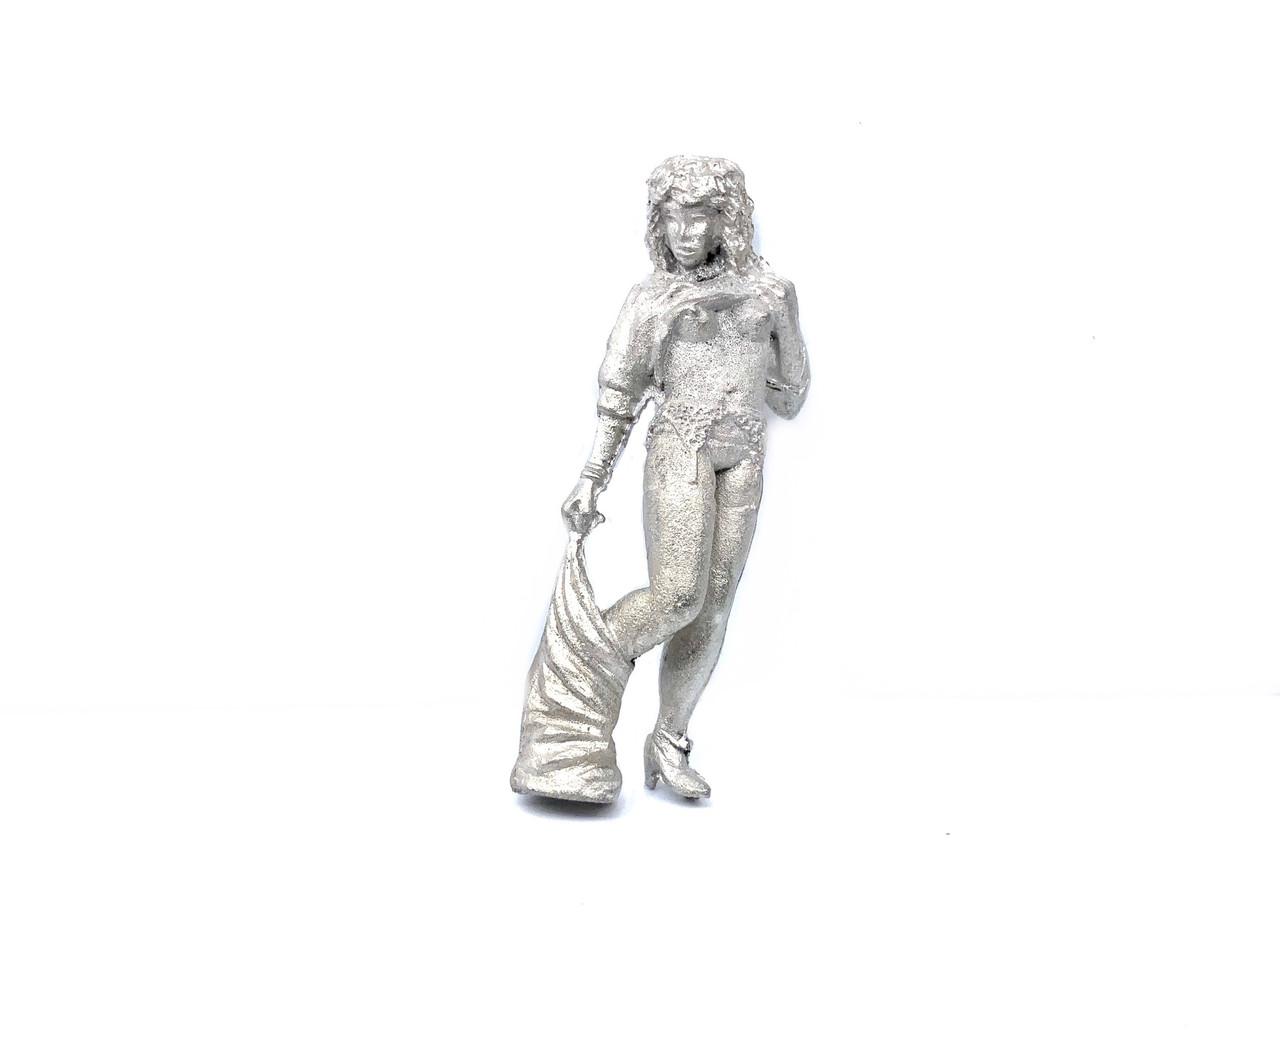 48-1272 Nude woman undressing brothel O Scale Figure FKA Keil Line unpainted